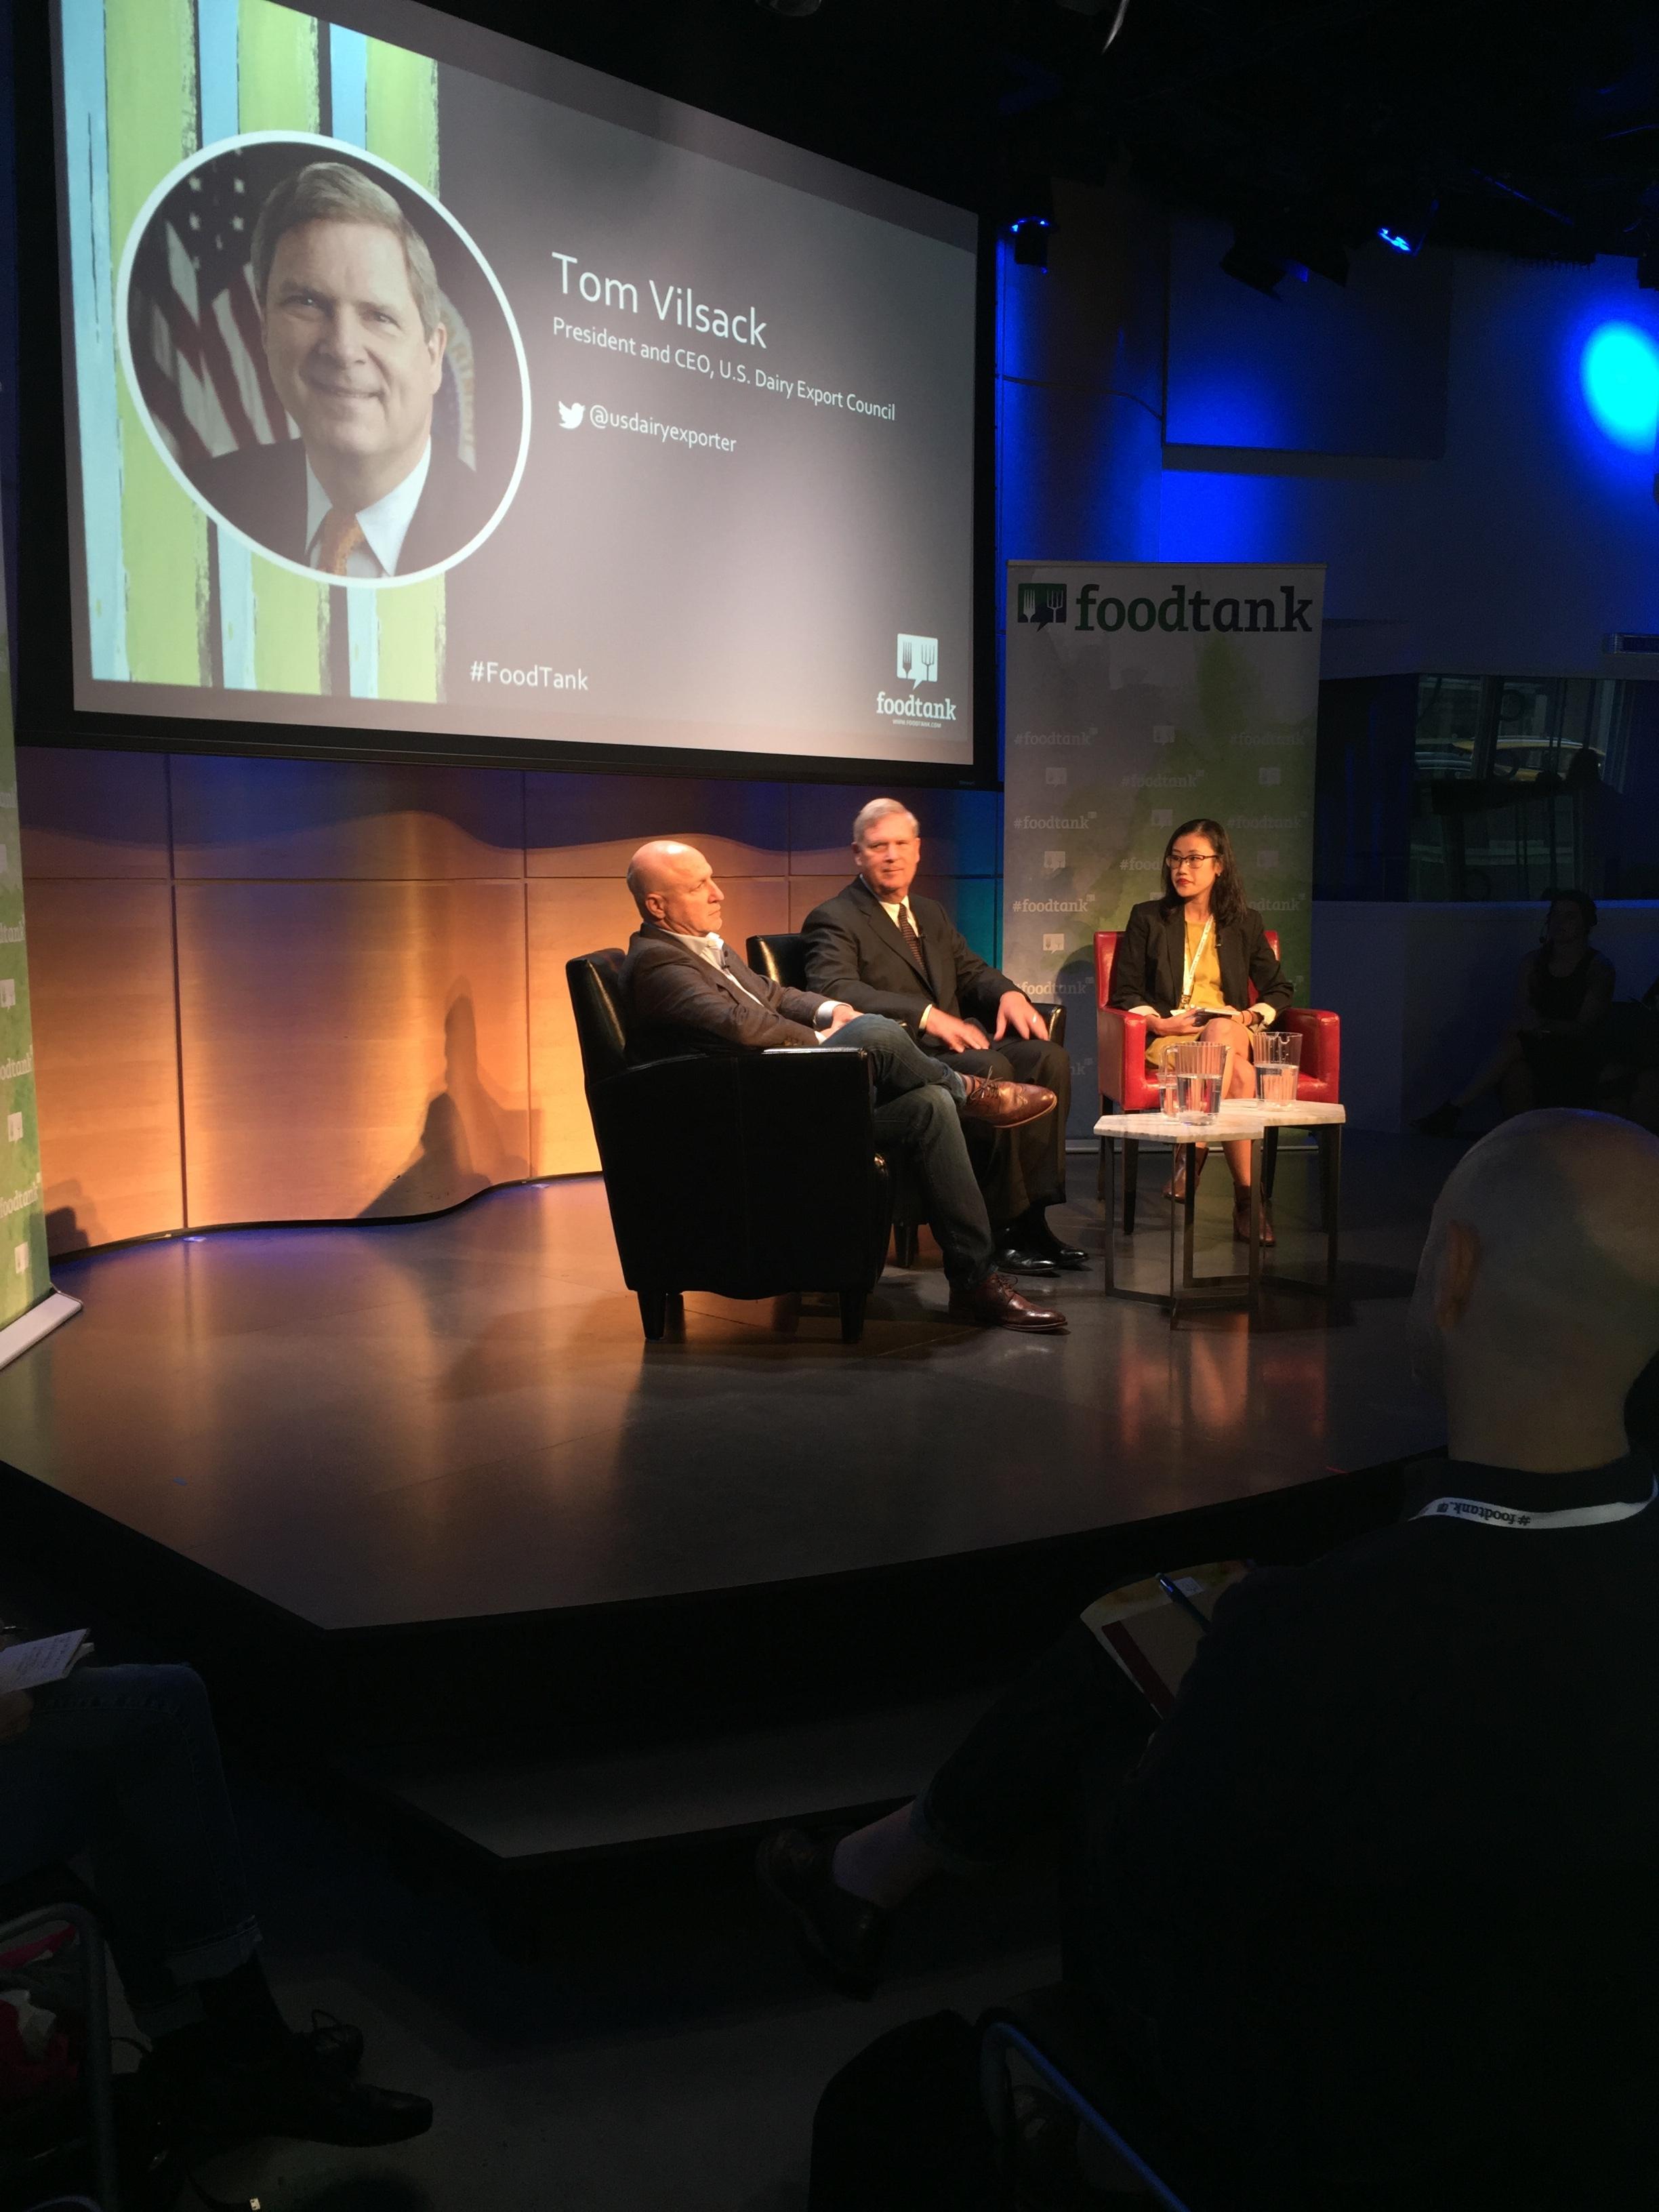 Former US Secretary of Agriculture, Tom Vislack discussing food waste.